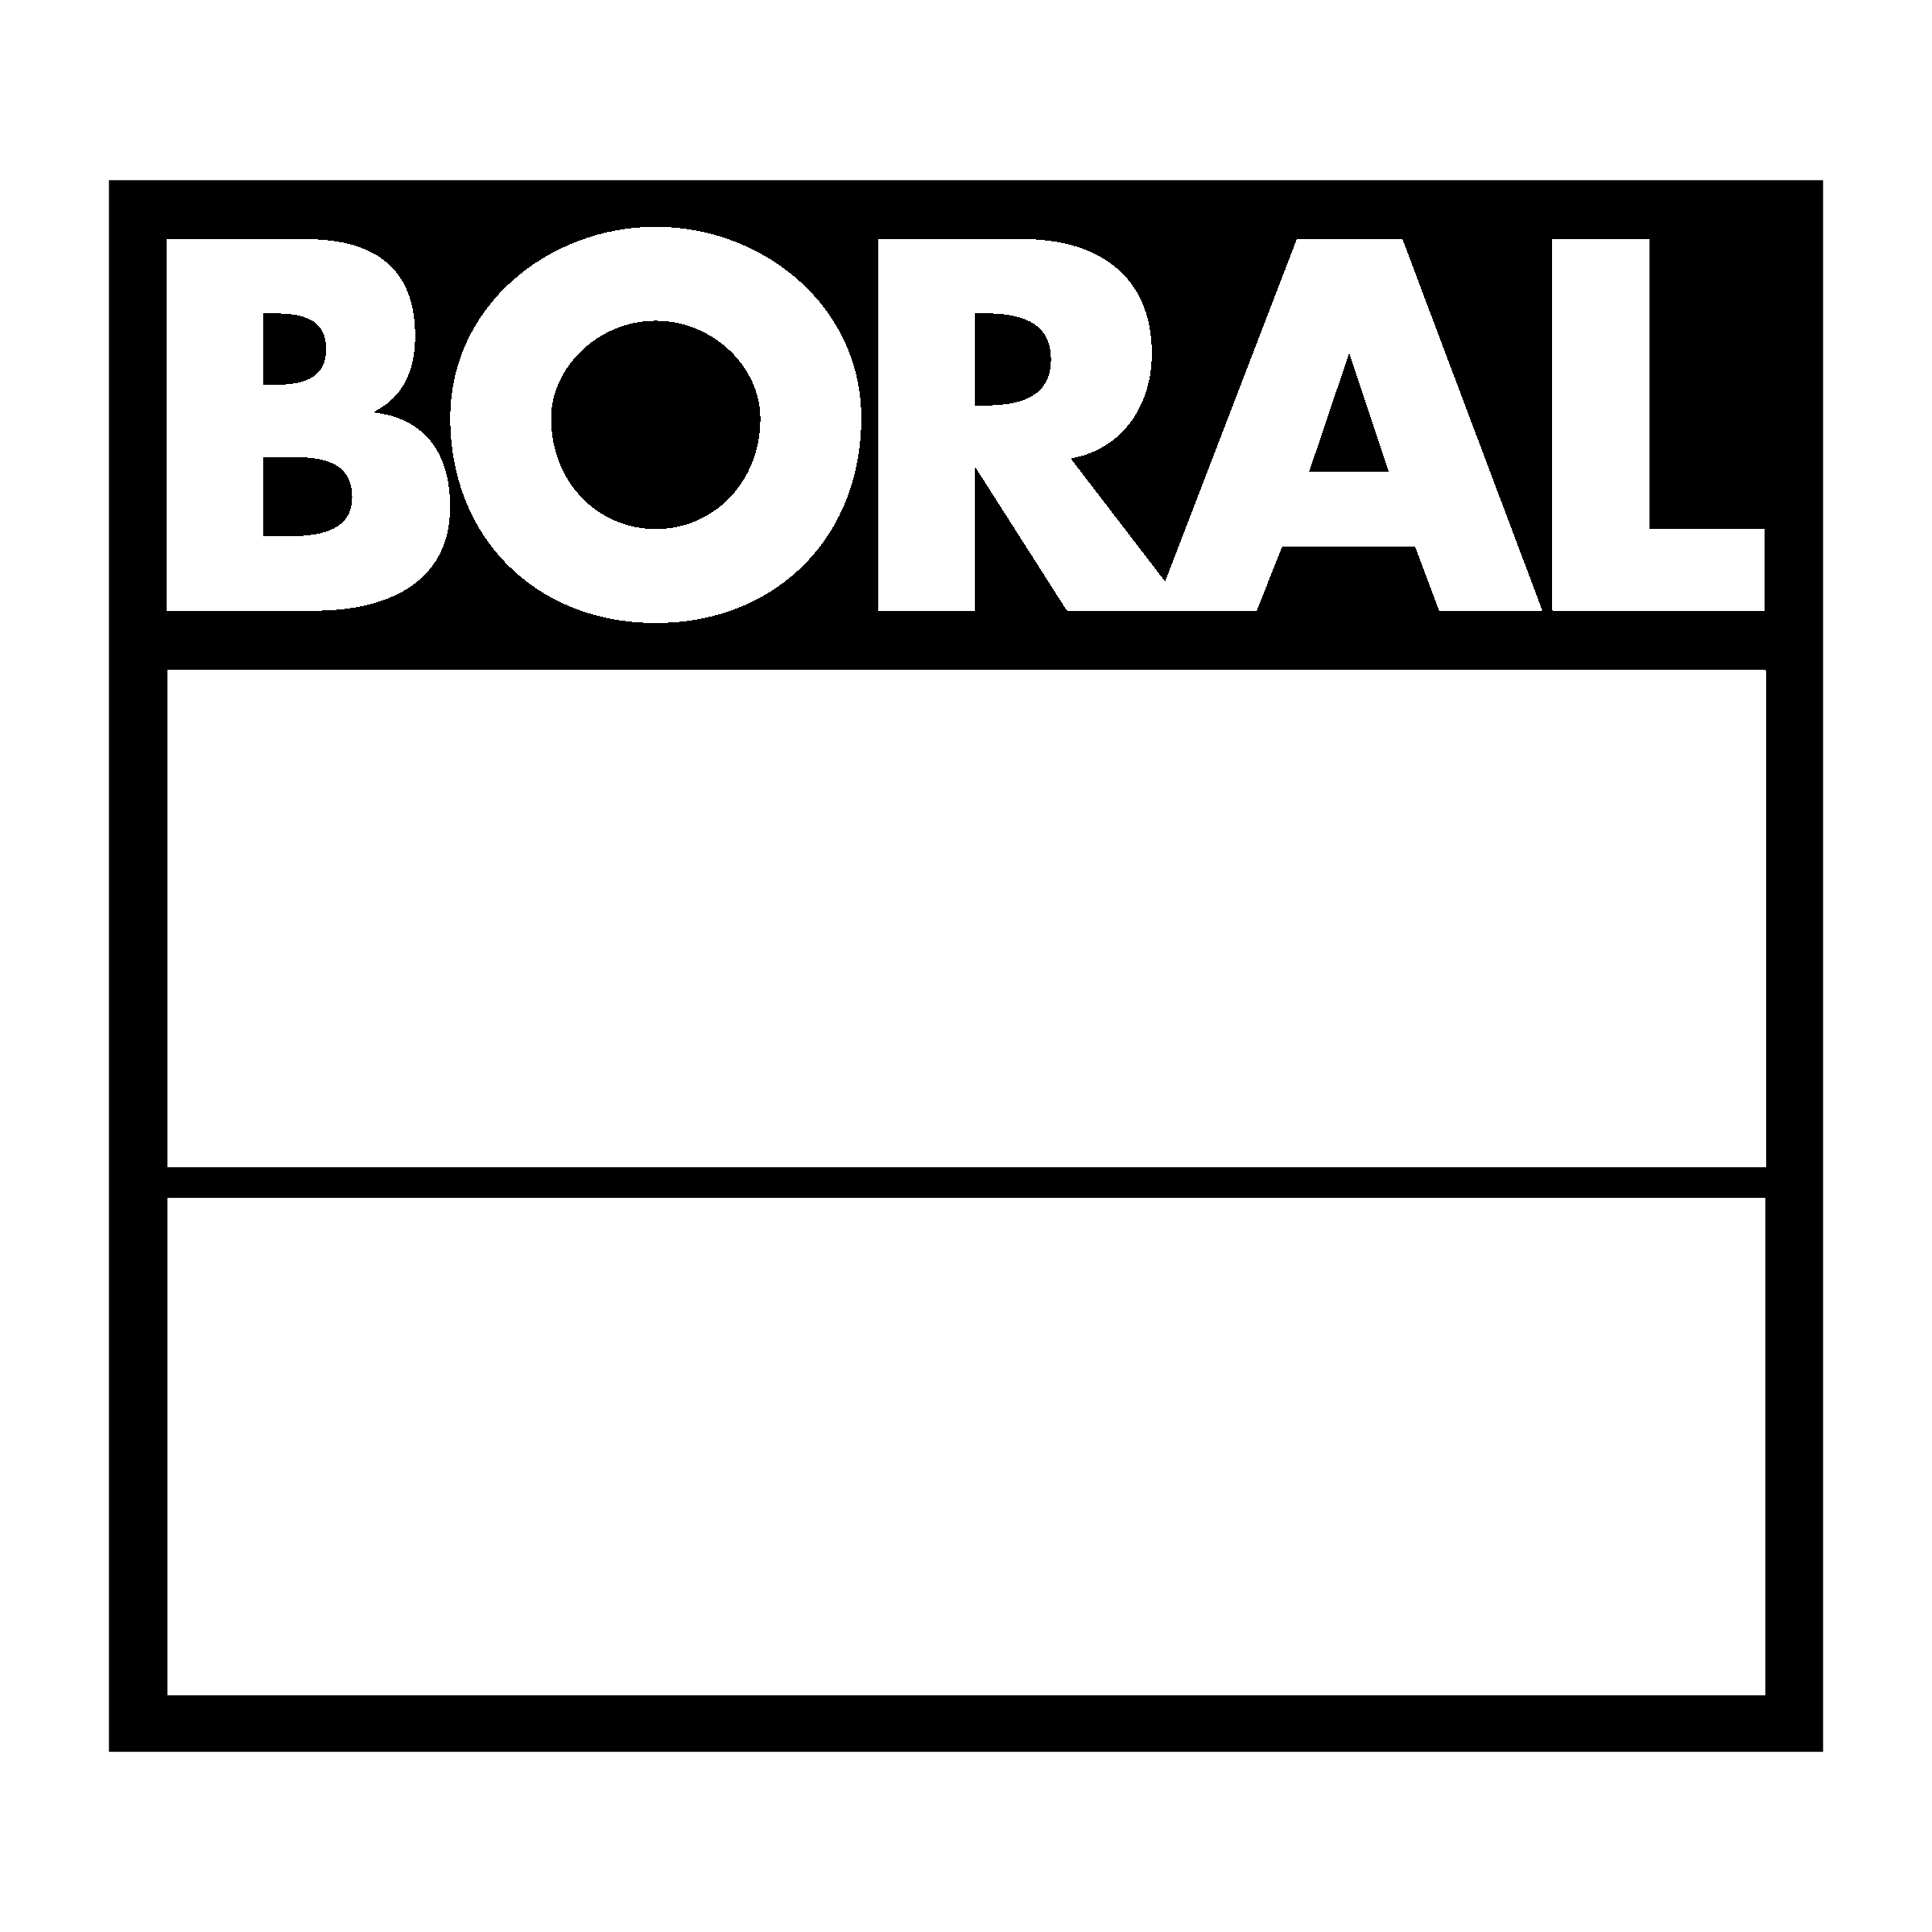 boral-logo-black-and-white